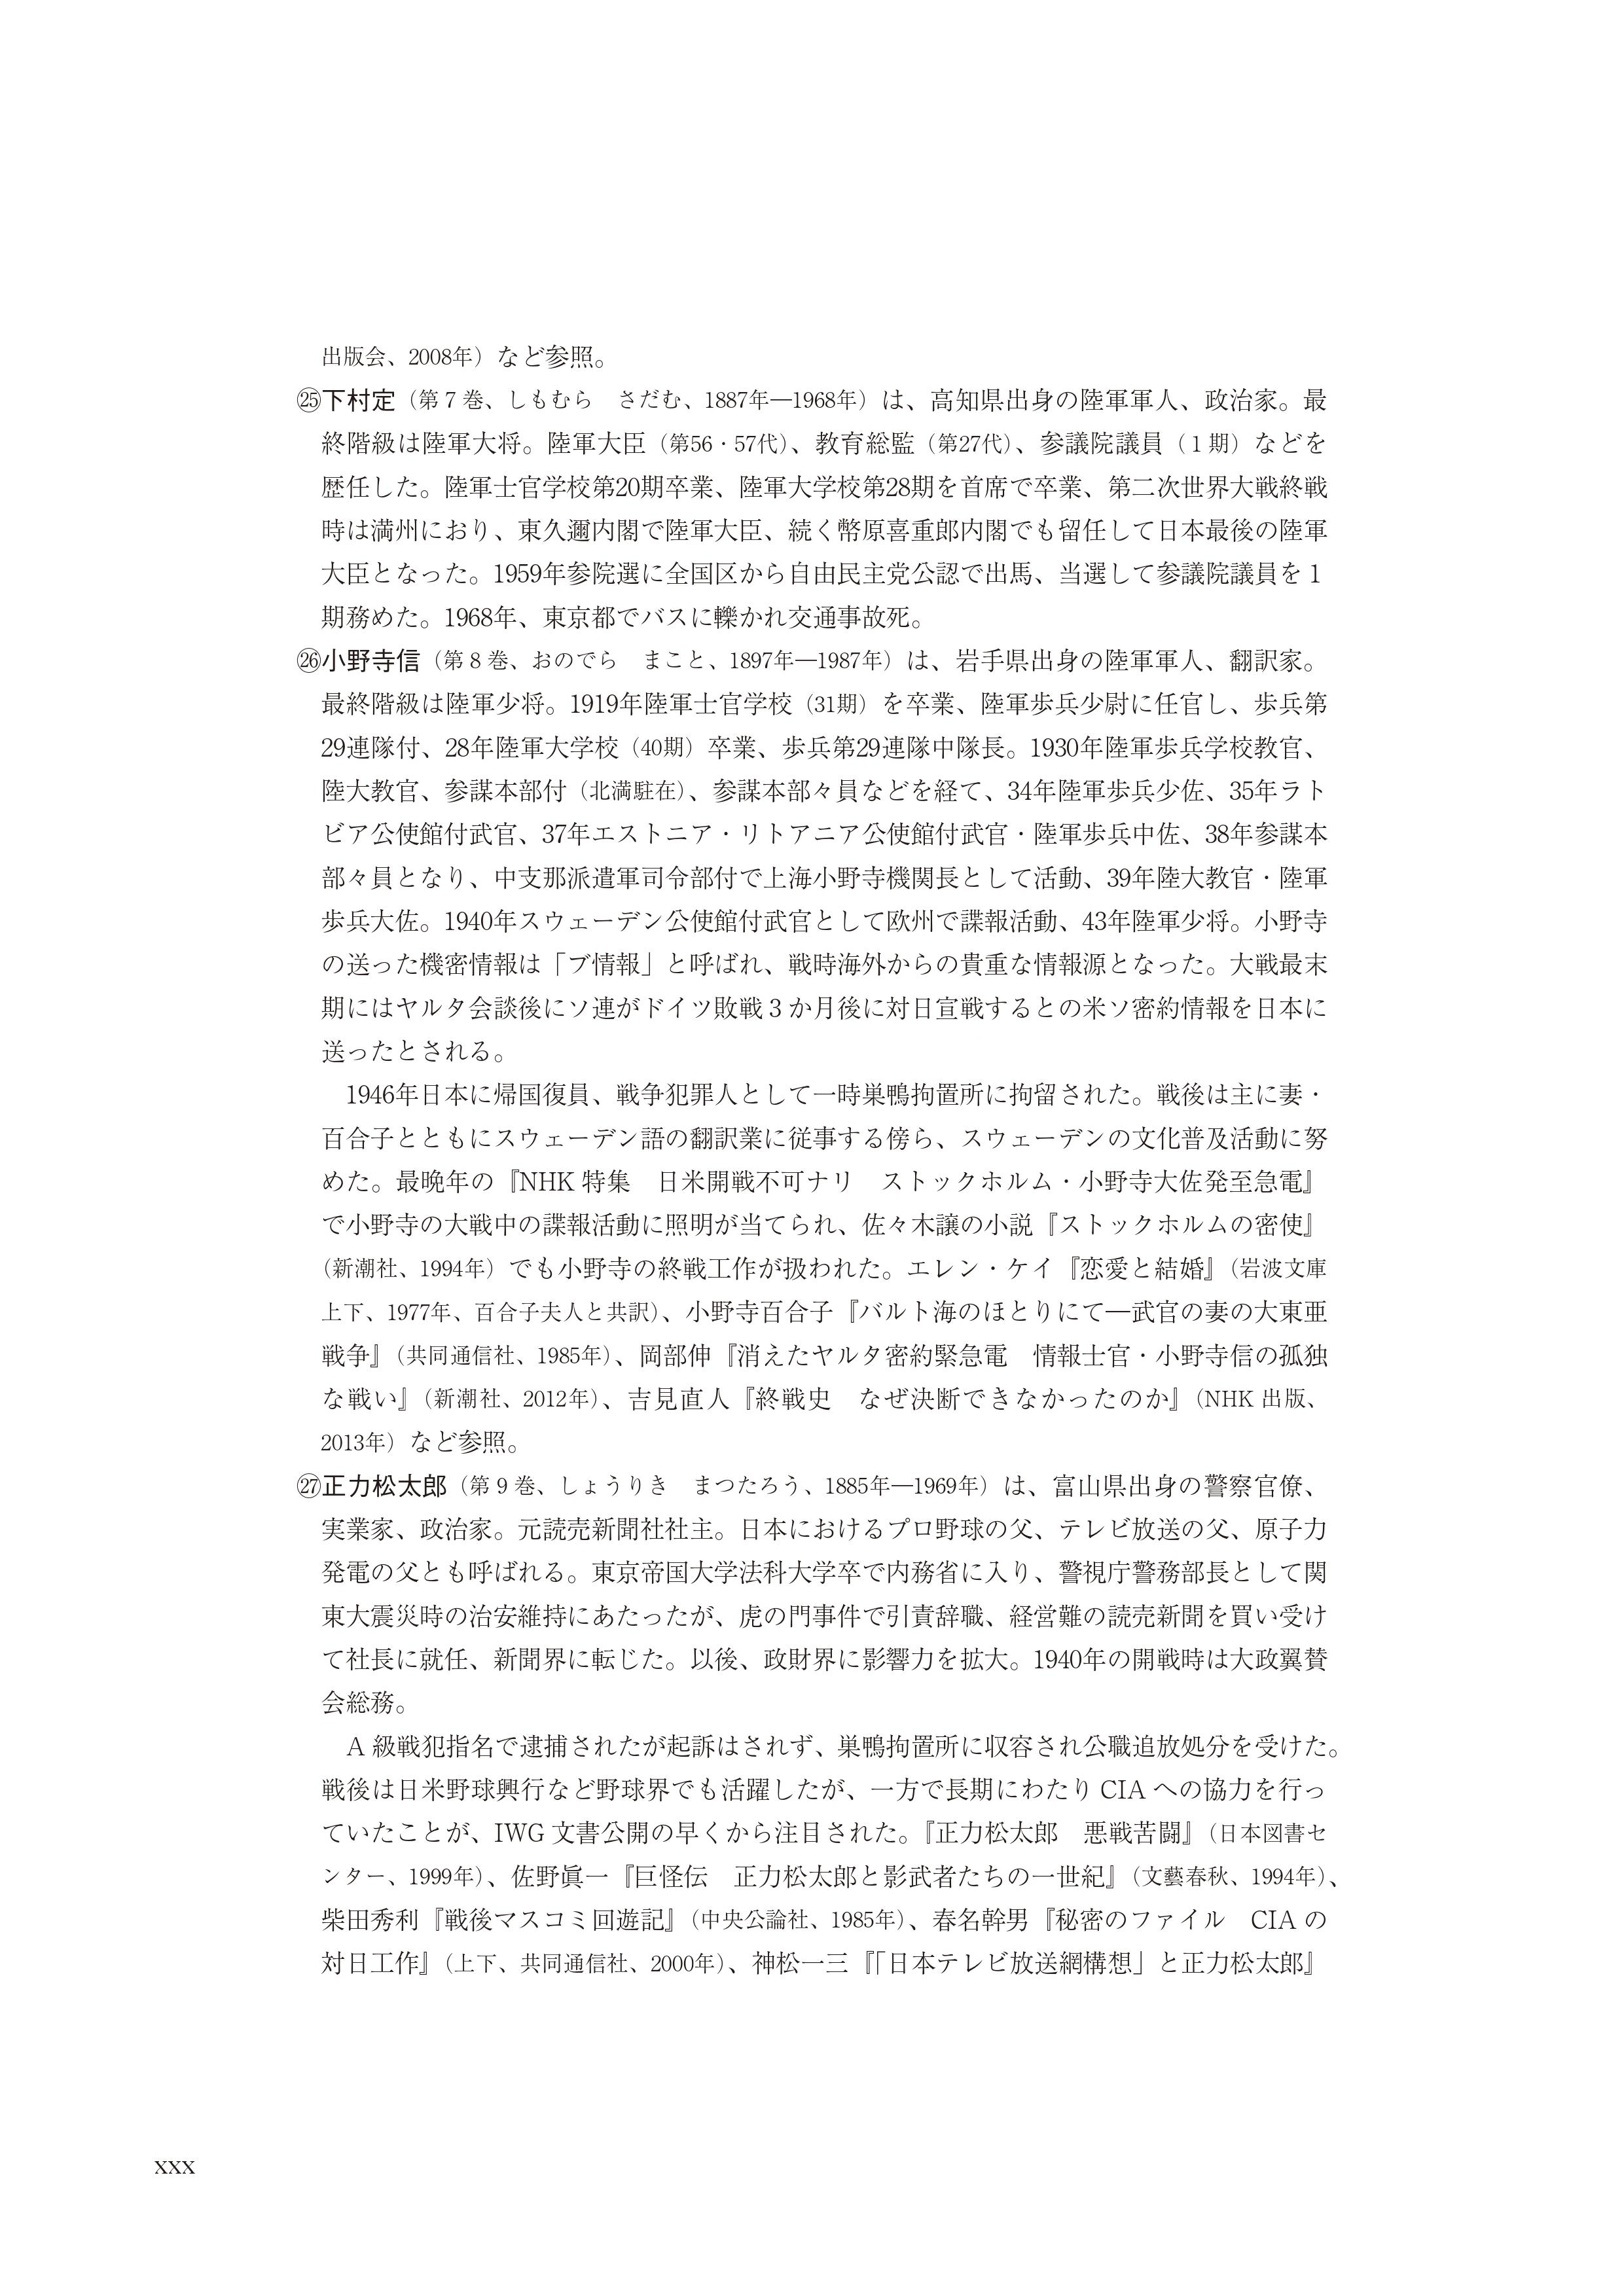 CIA日本人ファイル0001 (30)